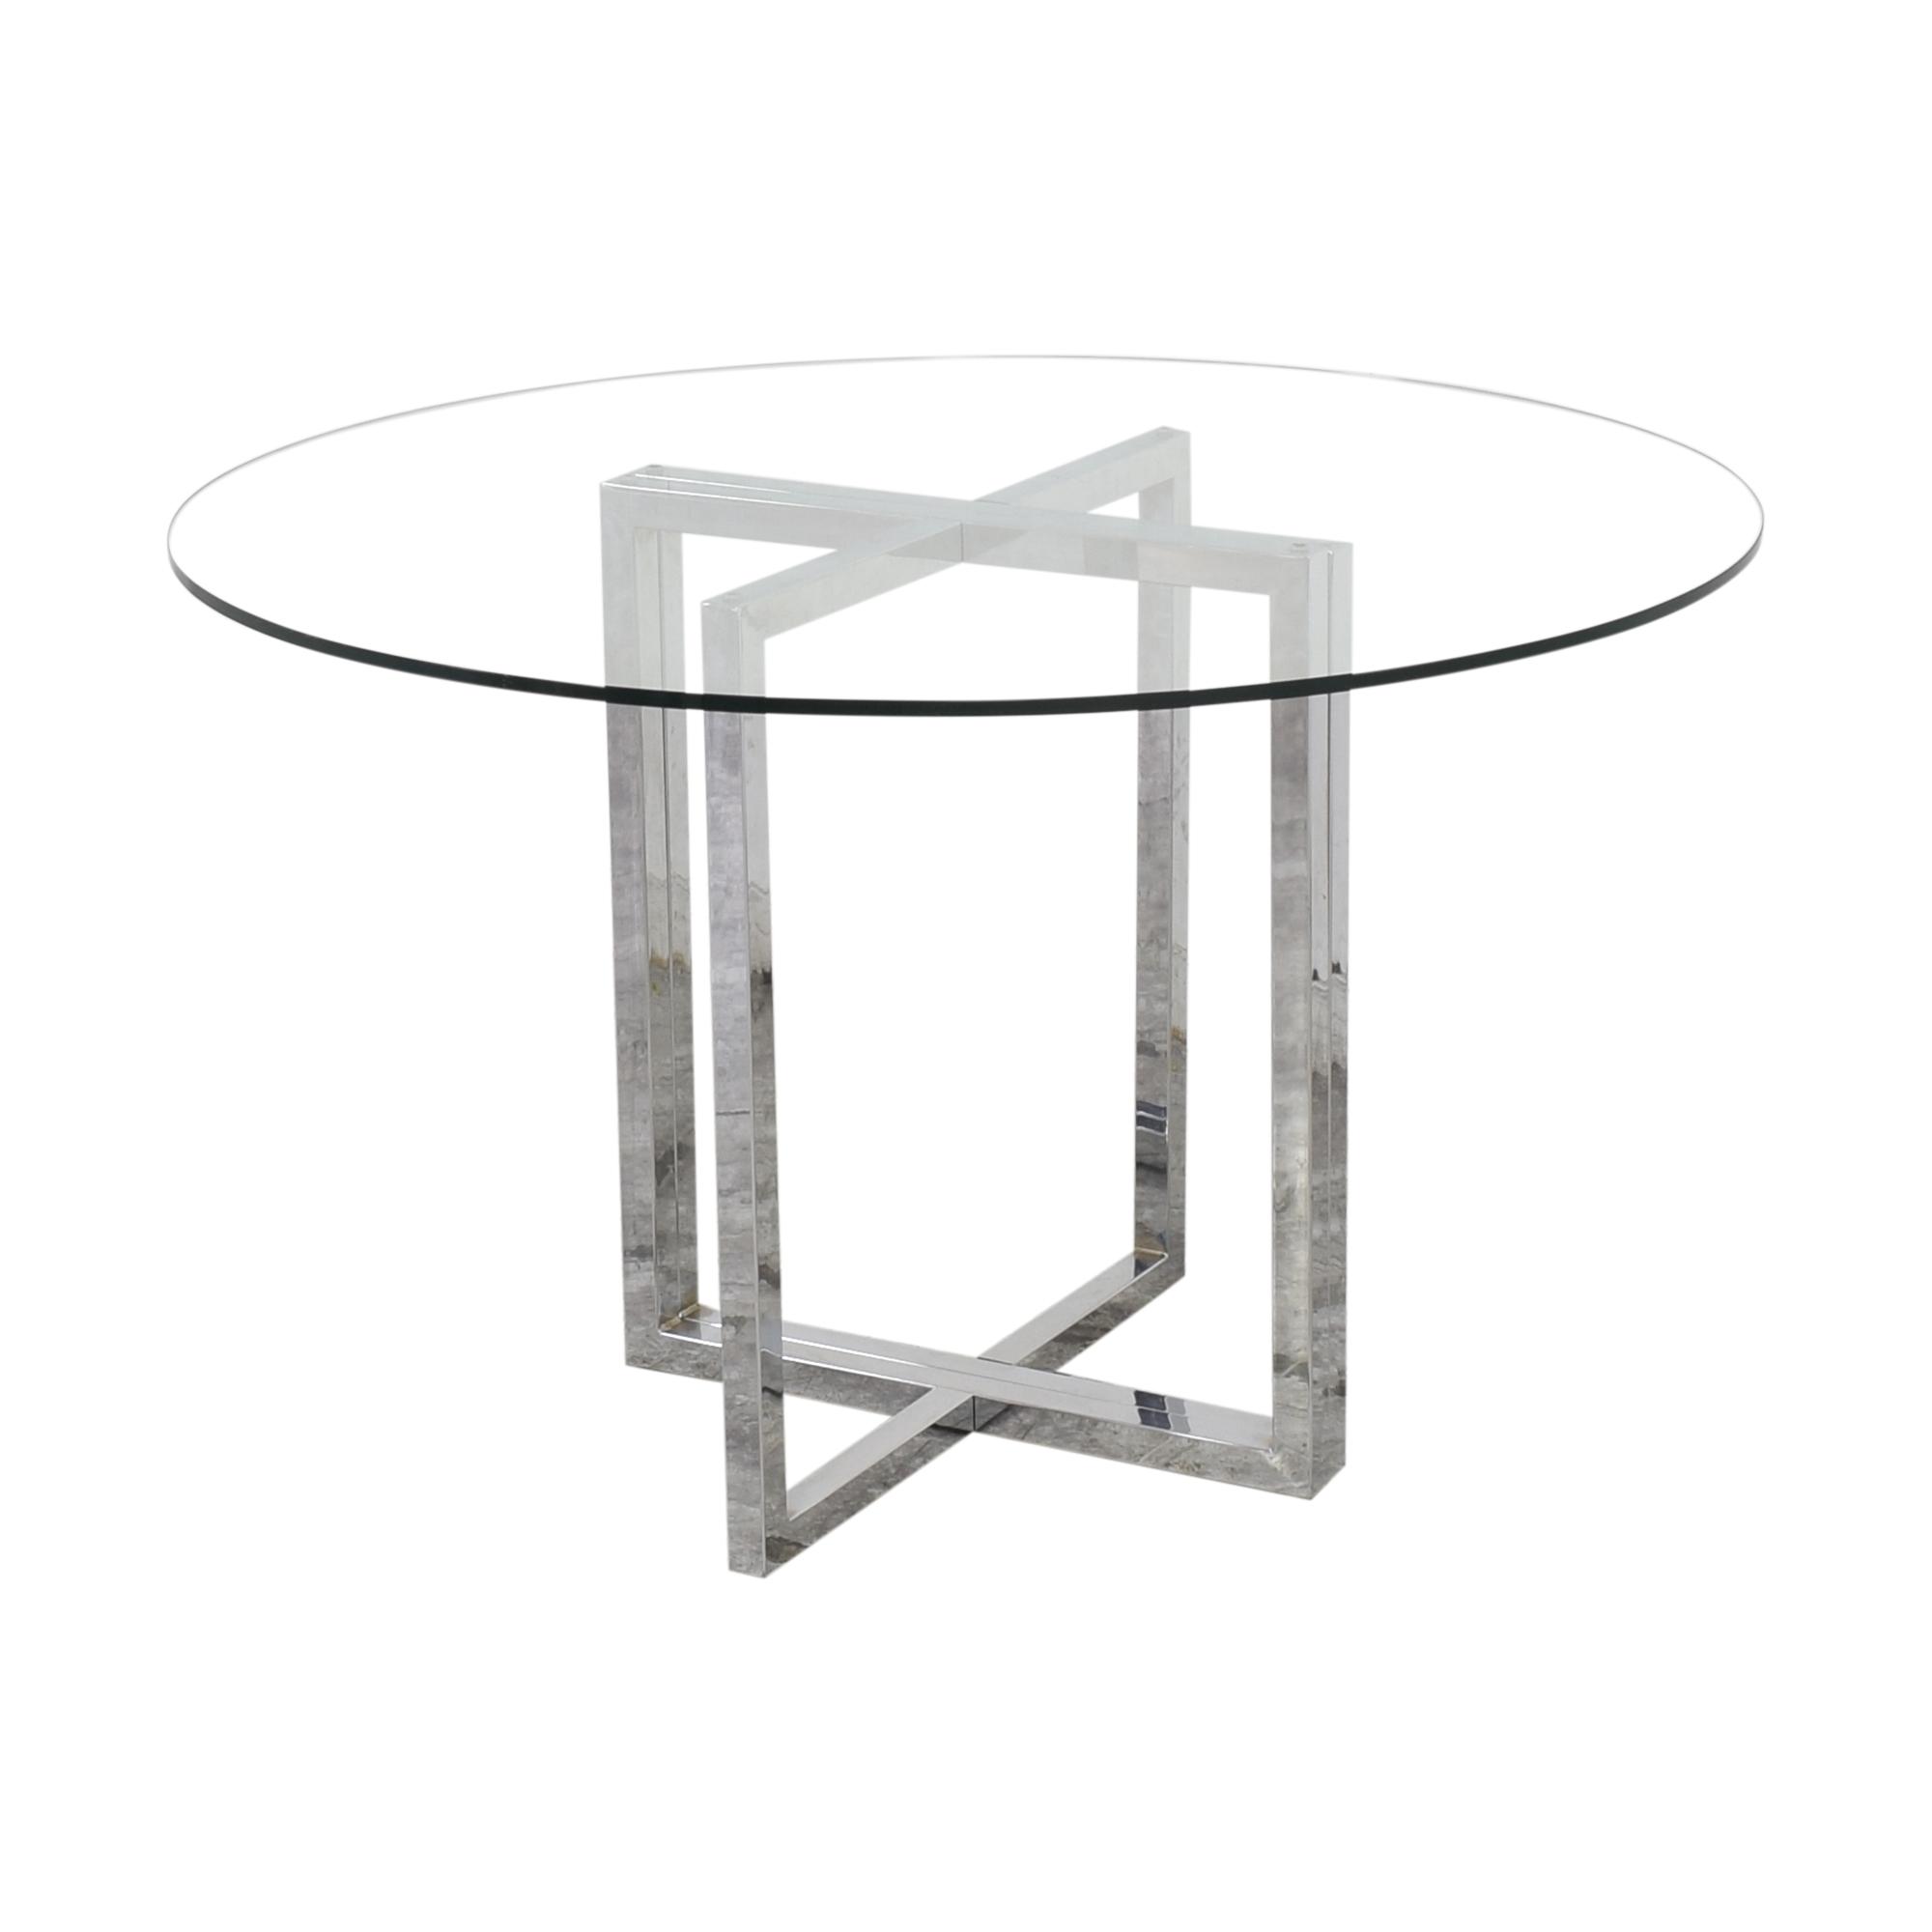 CB2 CB2 Silverado Table used